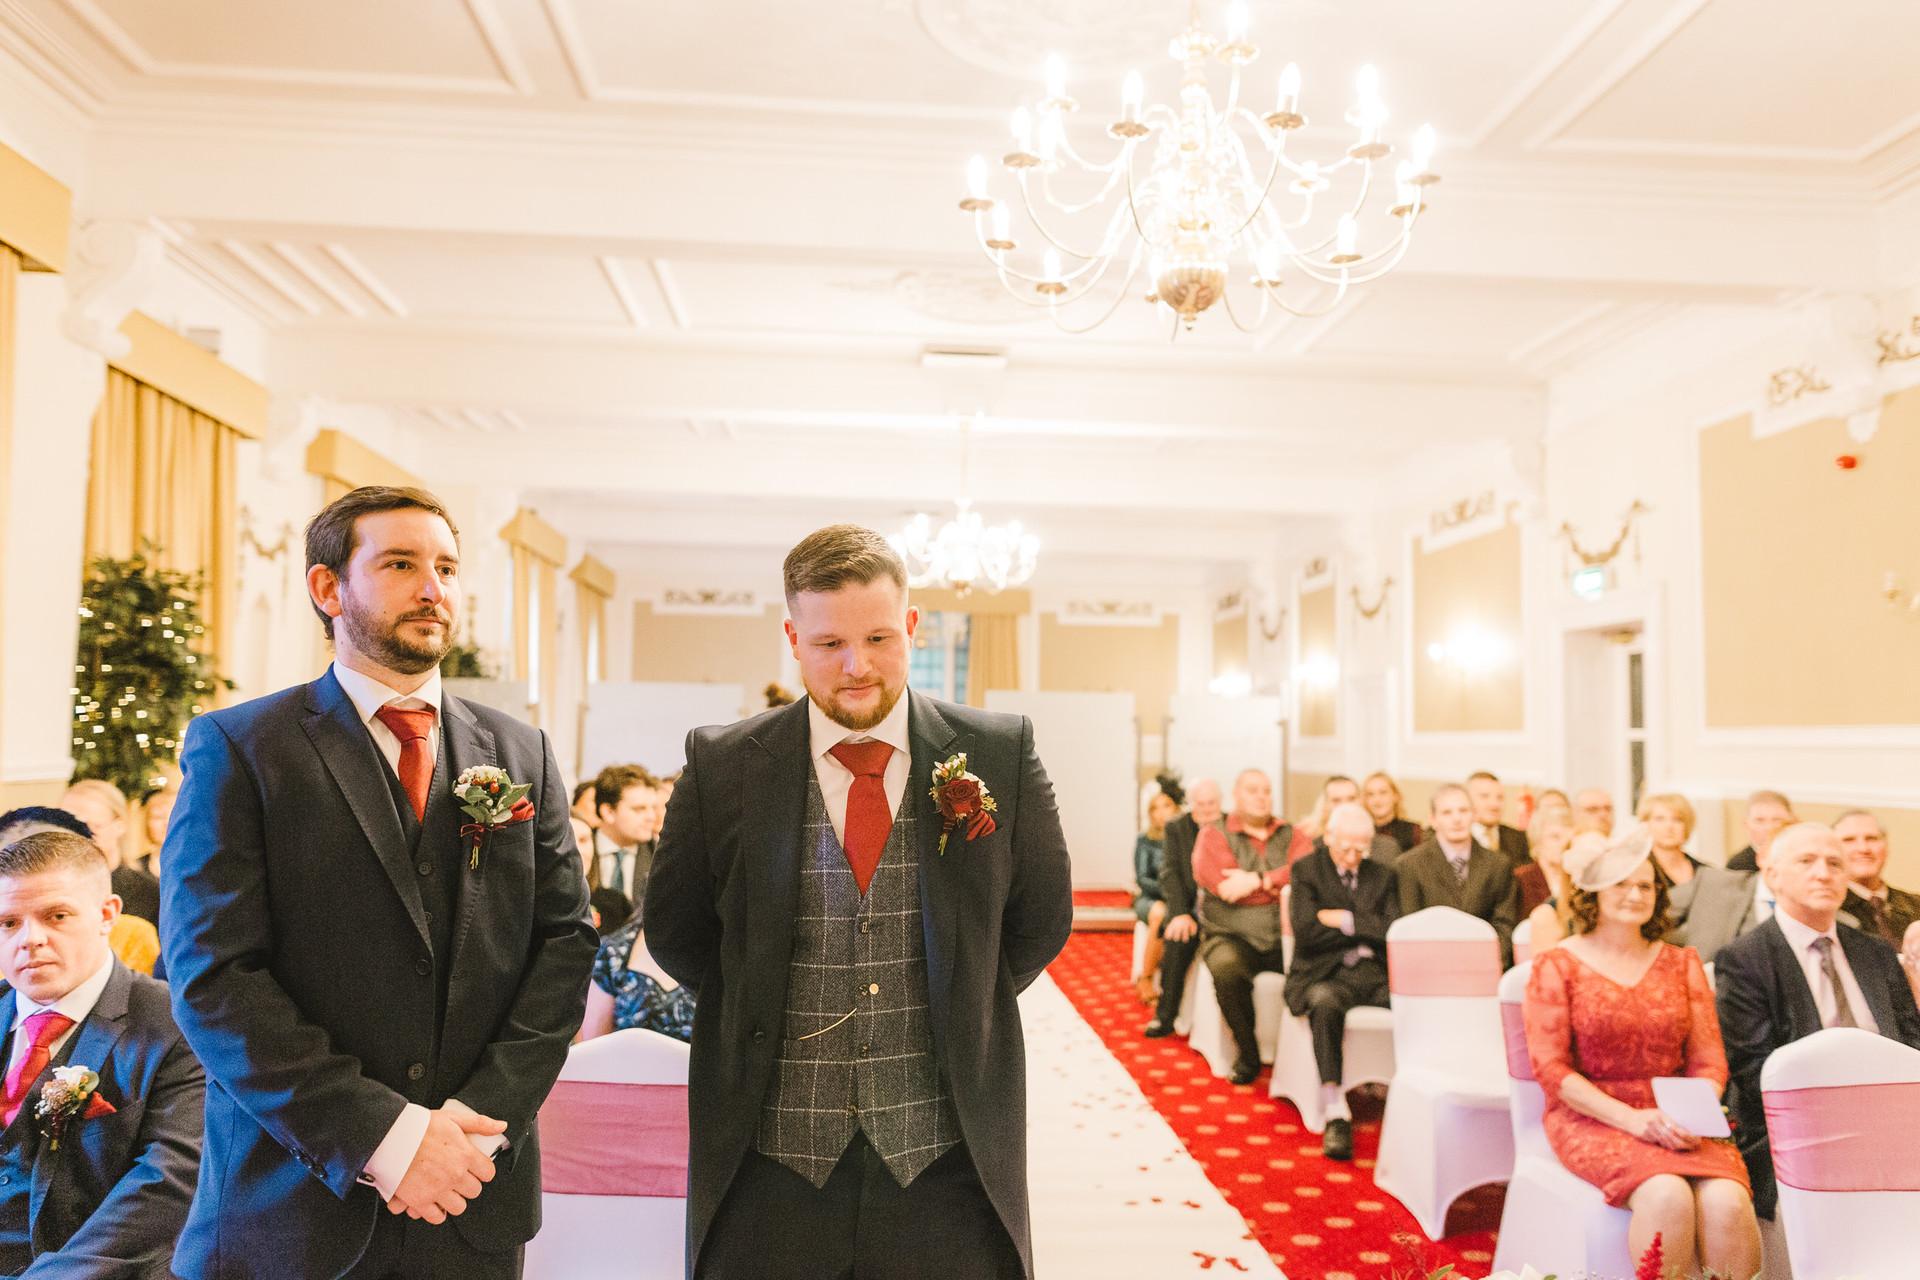 ilkley-west-yorkshire-wedding-122.jpg